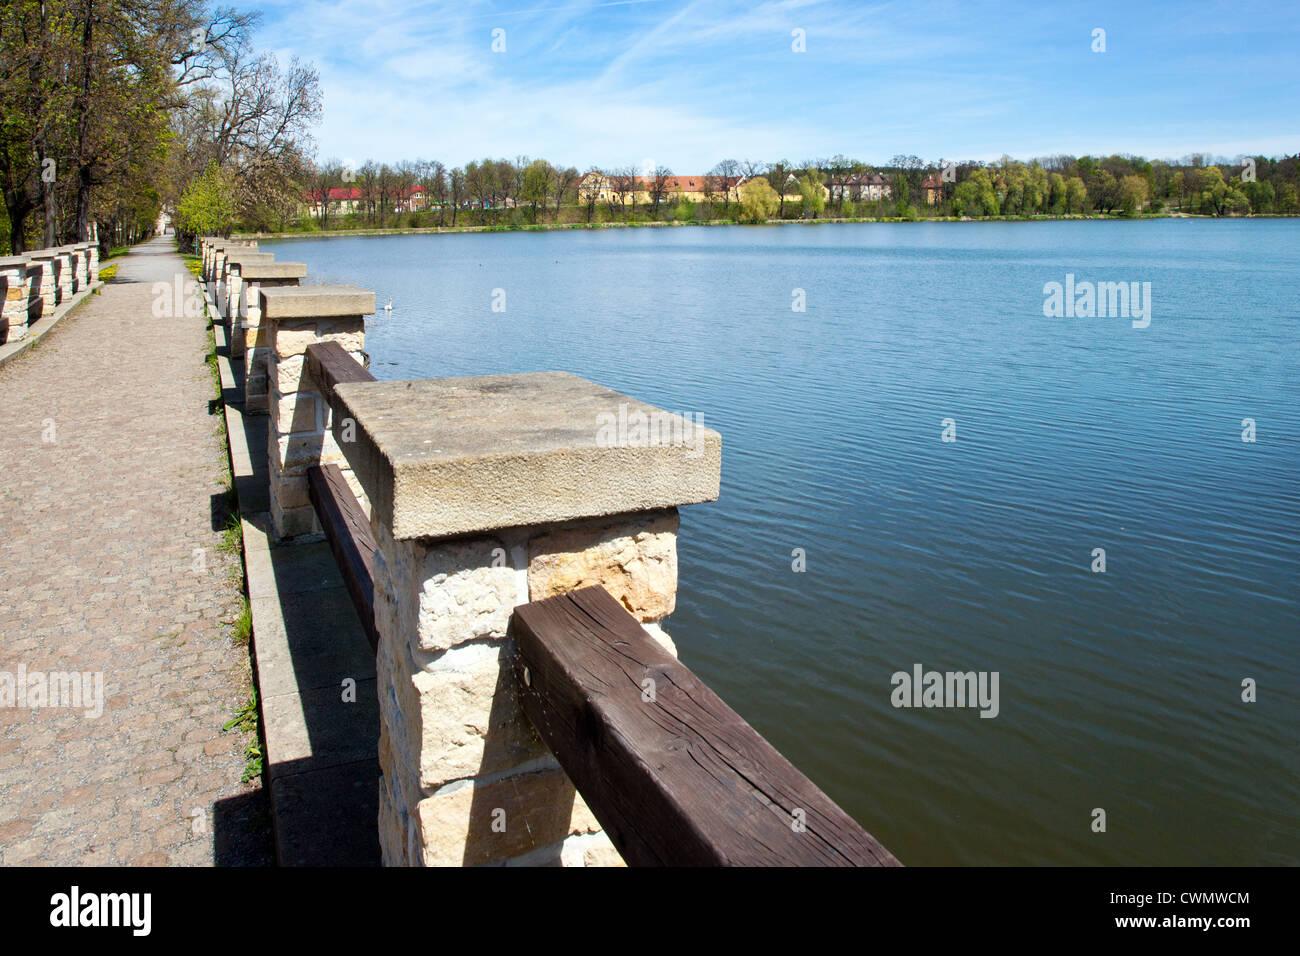 Pocernicky rybnik, Zamecky park, Dolni Pocernice, Praha, Ceska republika Stock Photo